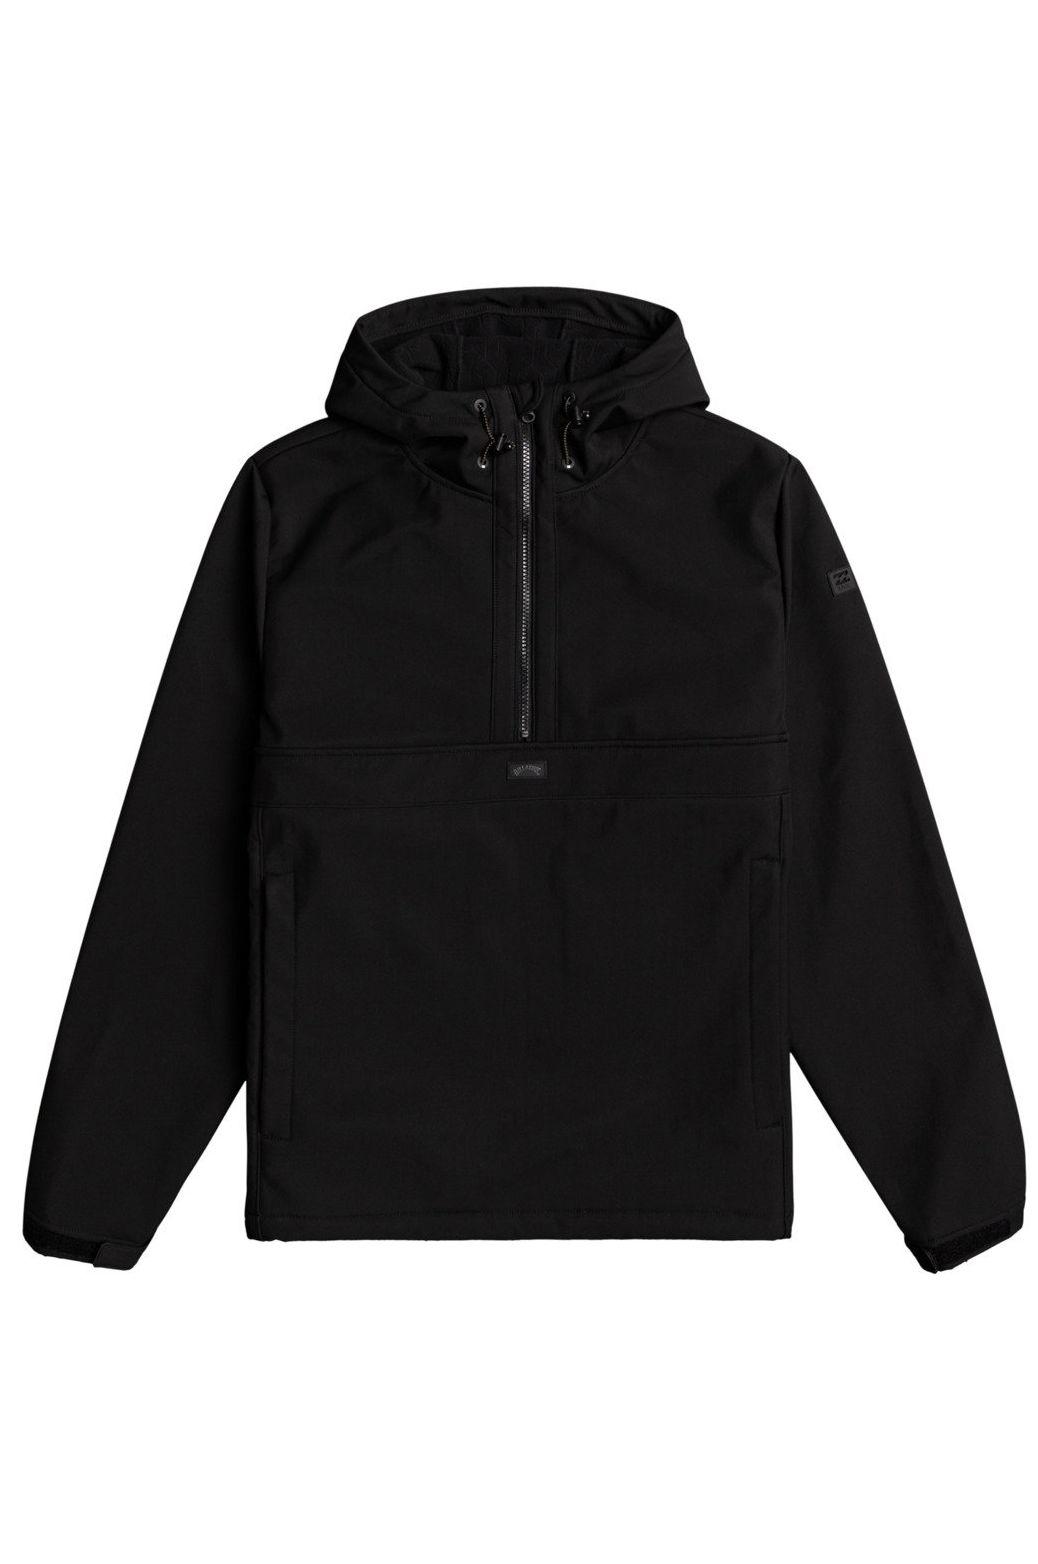 Billabong Jacket BOUNDARY GRAPHENE PO ADVENTURE DIVISION Black